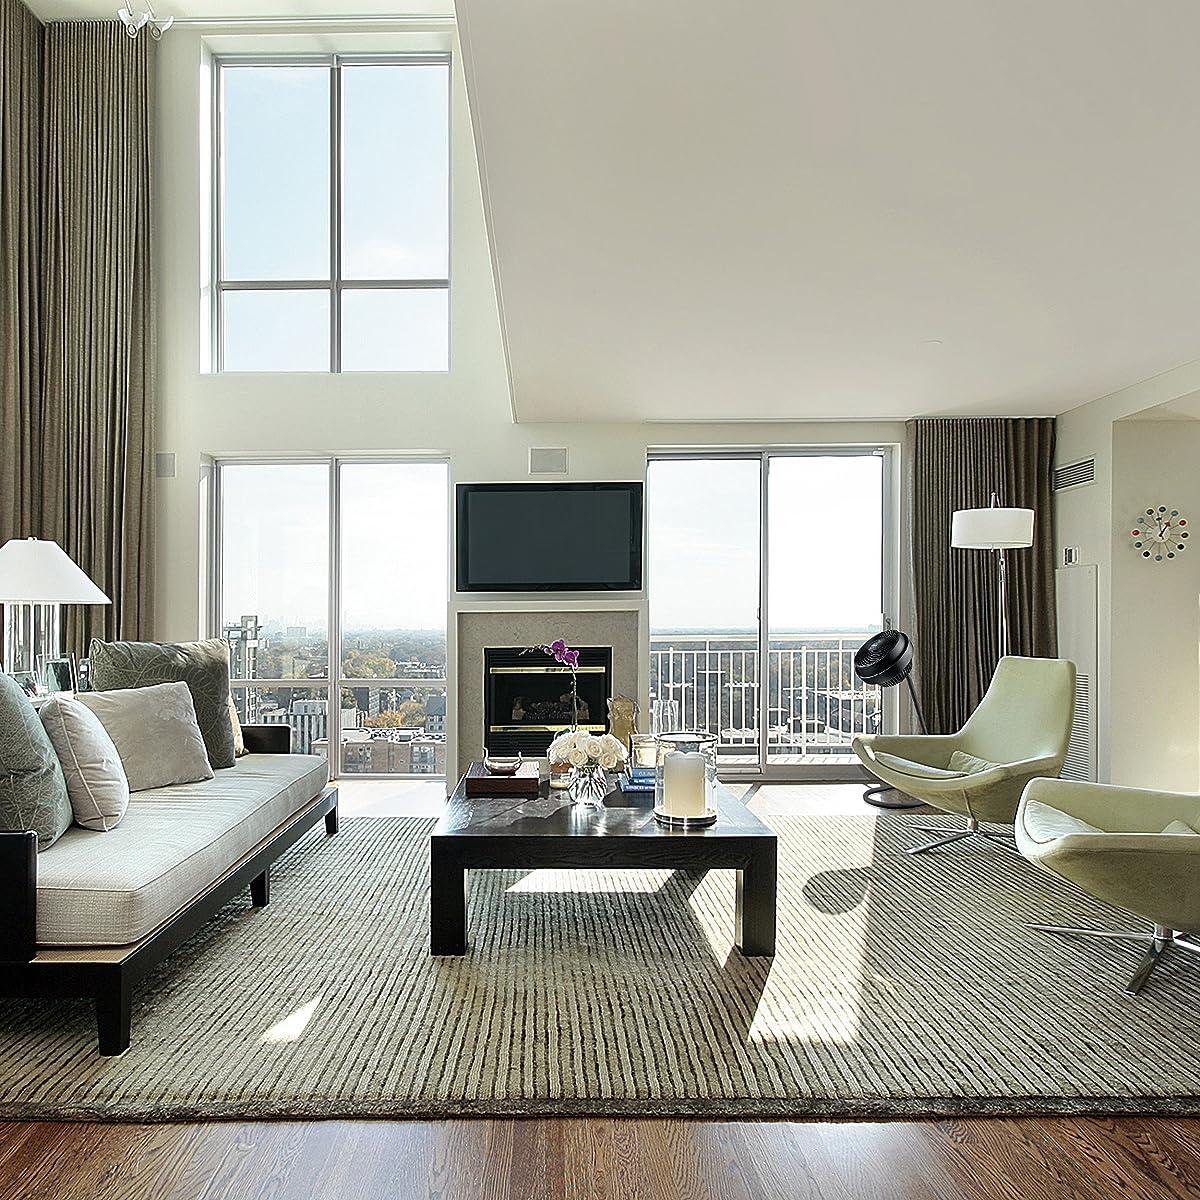 Vornado 783 Full-Size Whole Room Air Circulator, Adjustable Height